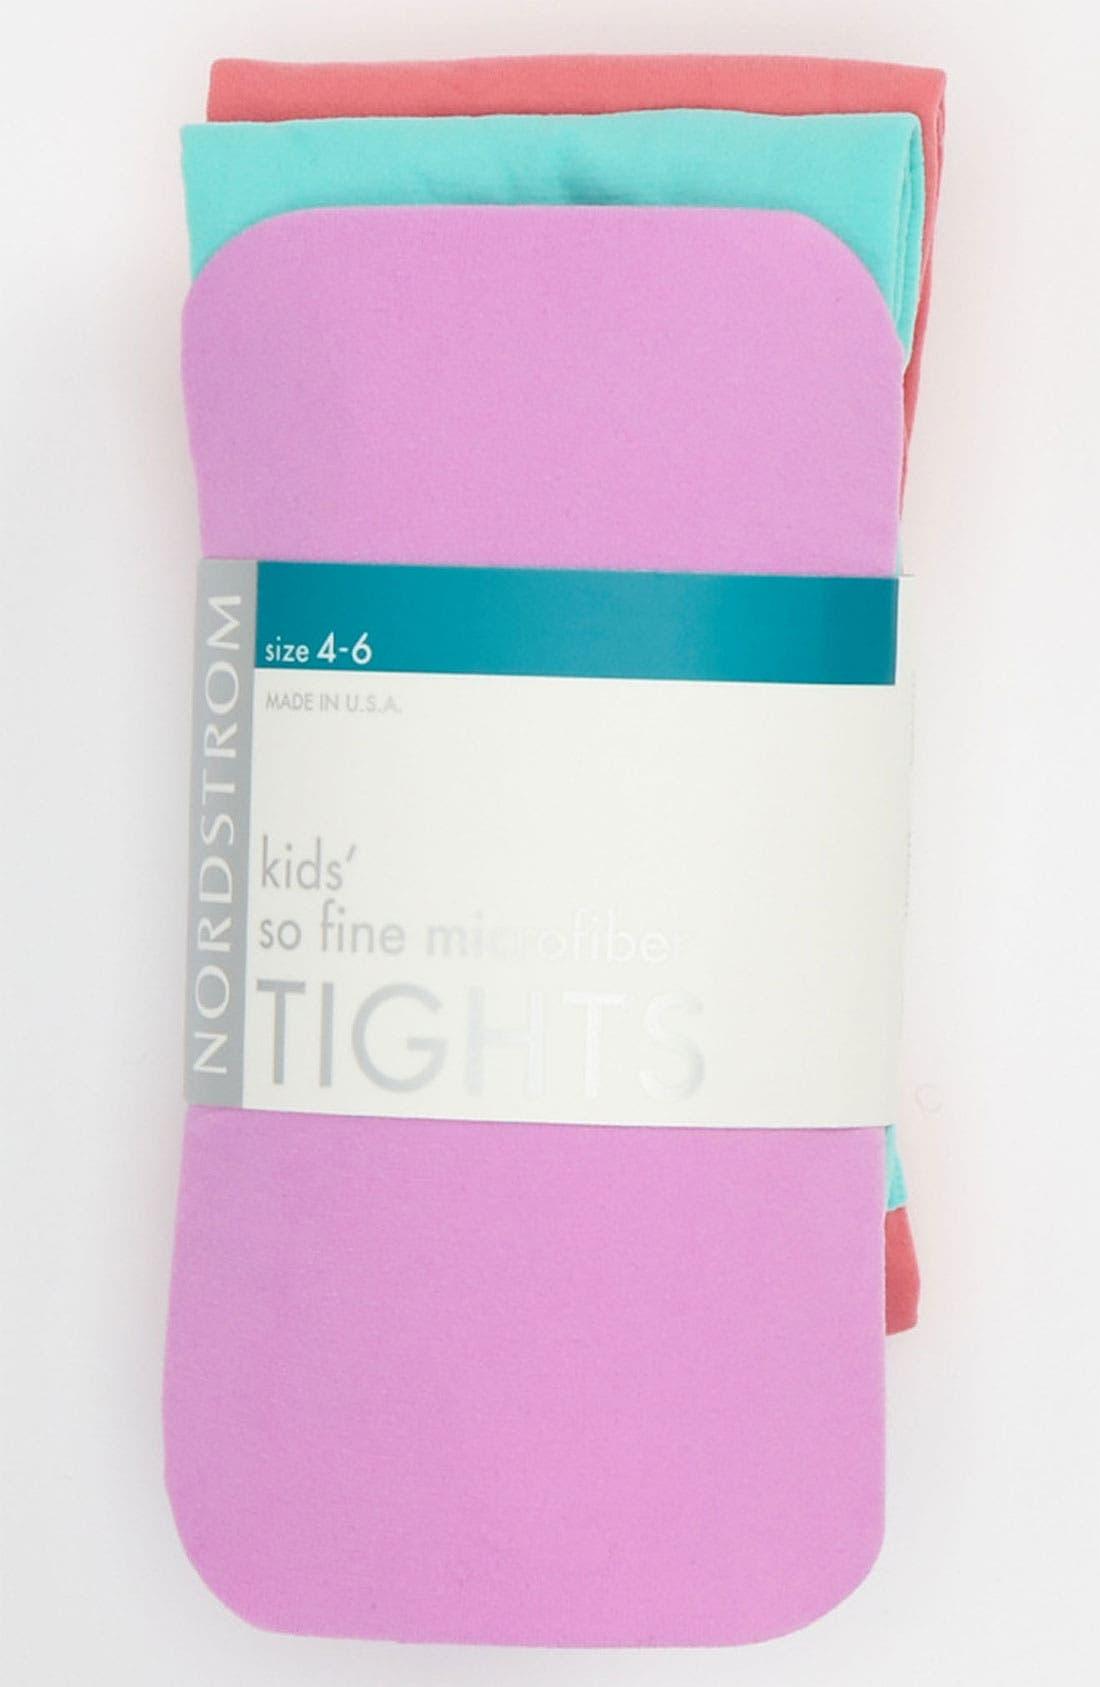 Alternate Image 1 Selected - Nordstrom 'So Fine' Microfiber Tights (3-Pack) (Girls)